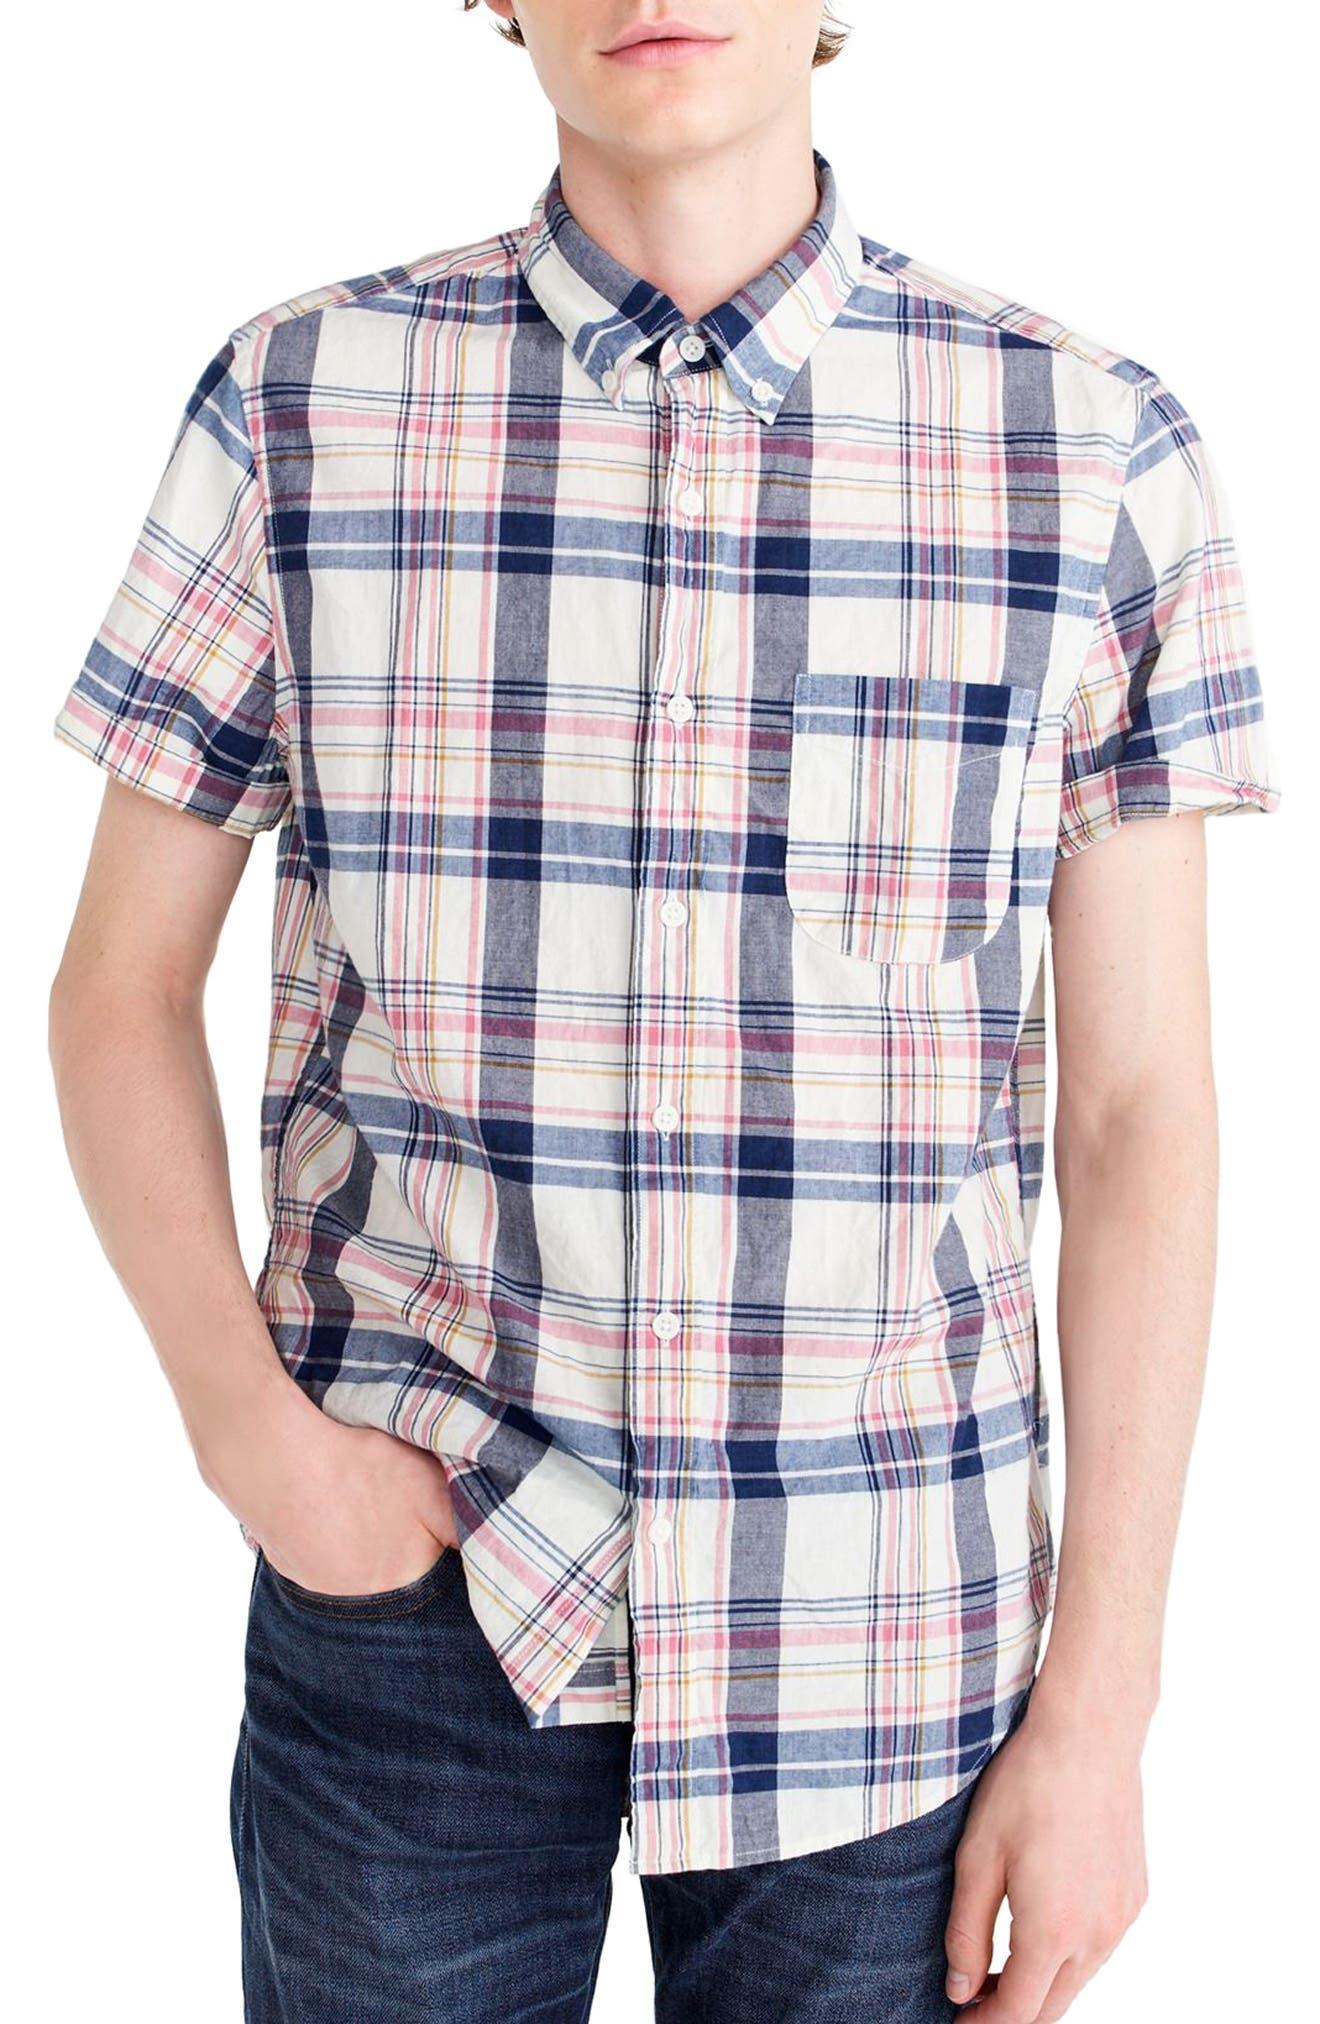 Indigo Plaid Short Sleeve Madras Shirt,                             Main thumbnail 1, color,                             Indigo Creme